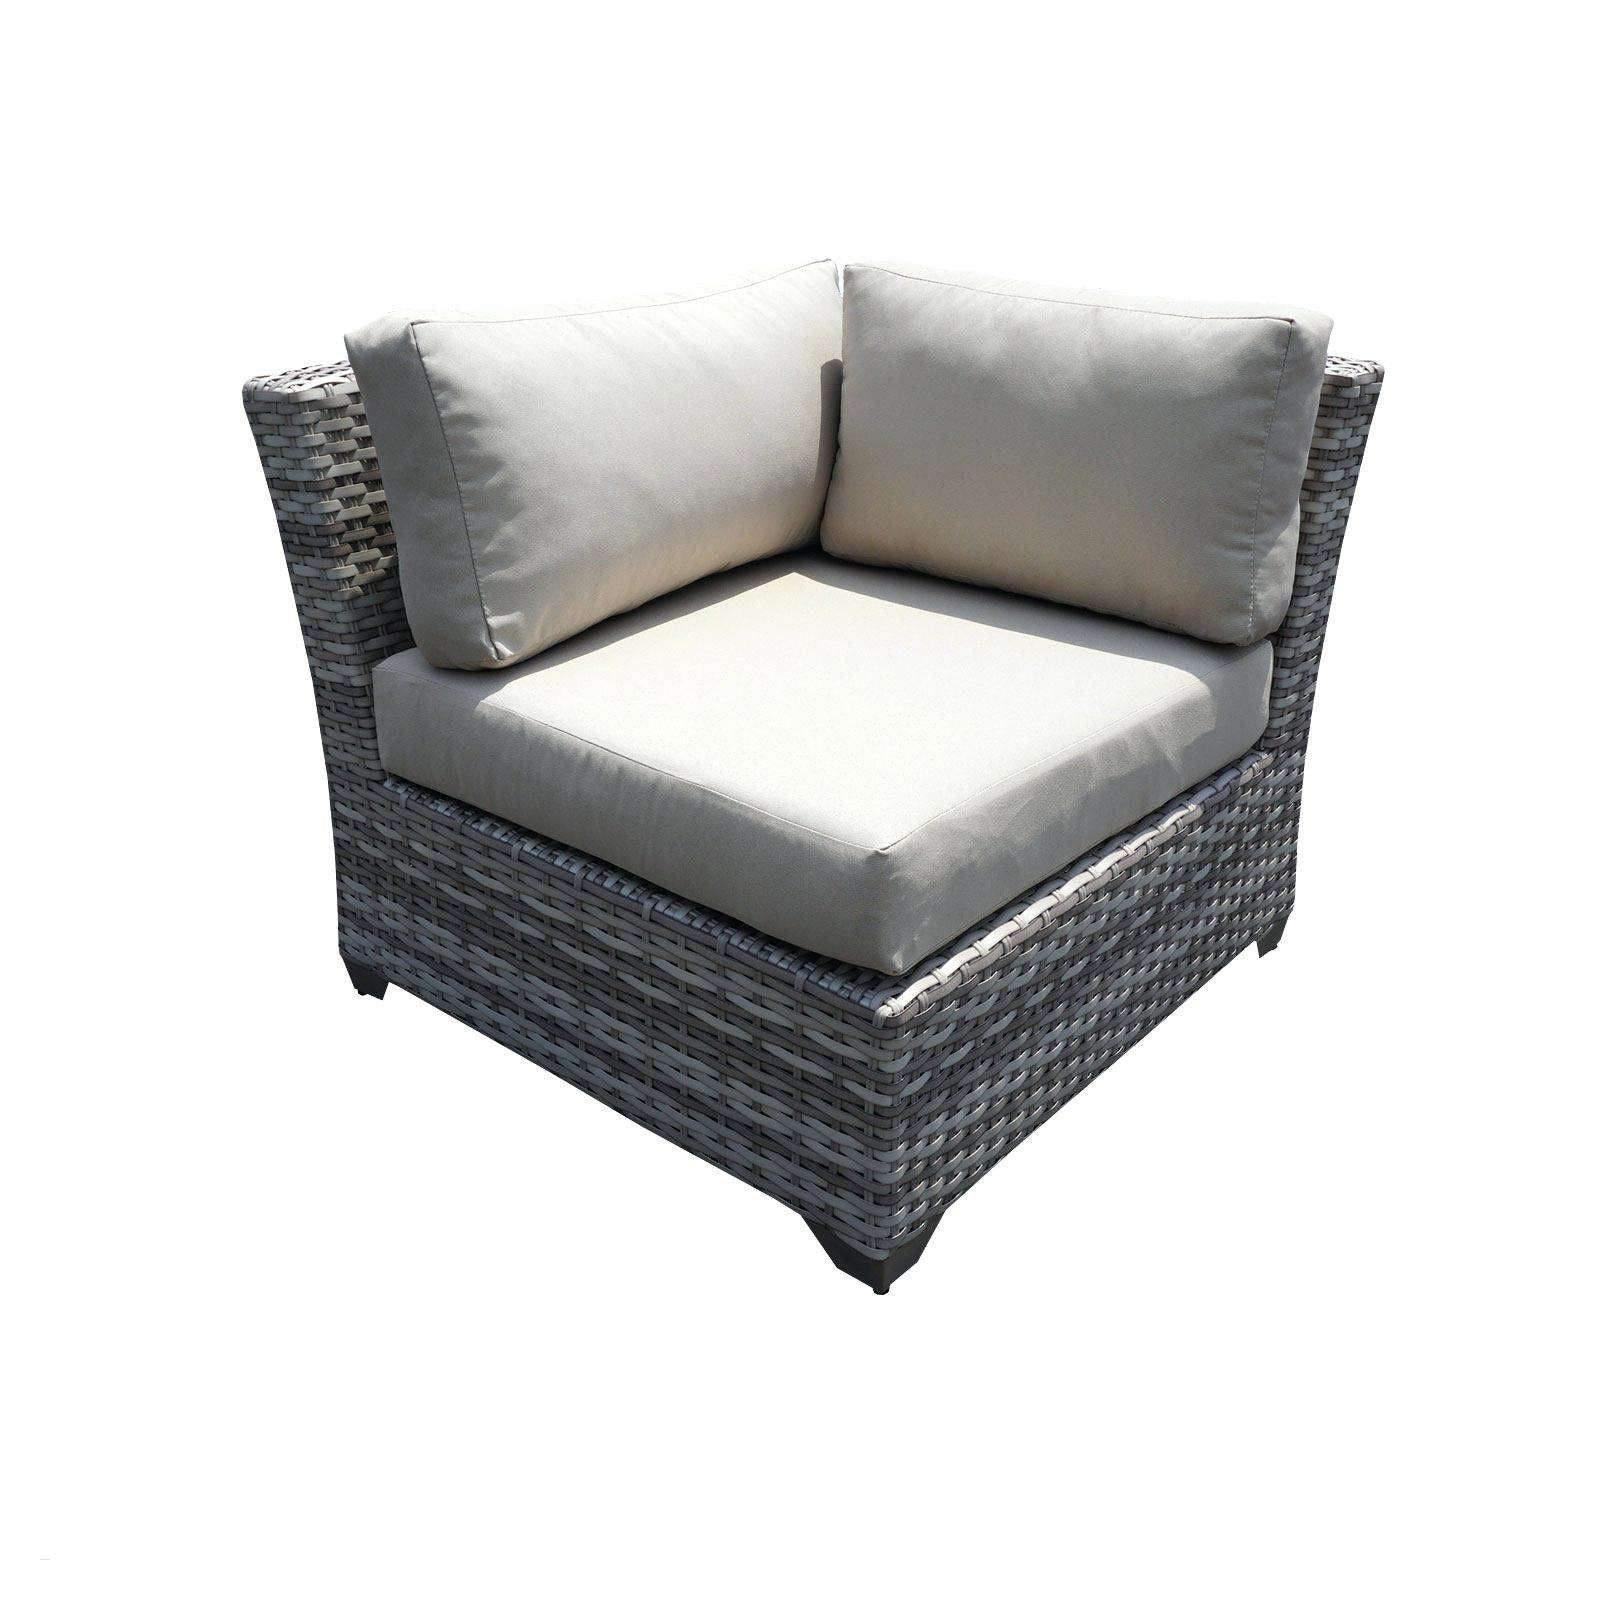 Garten Ecksofa Genial 29 Frische Bräune Sectional sofa sofa